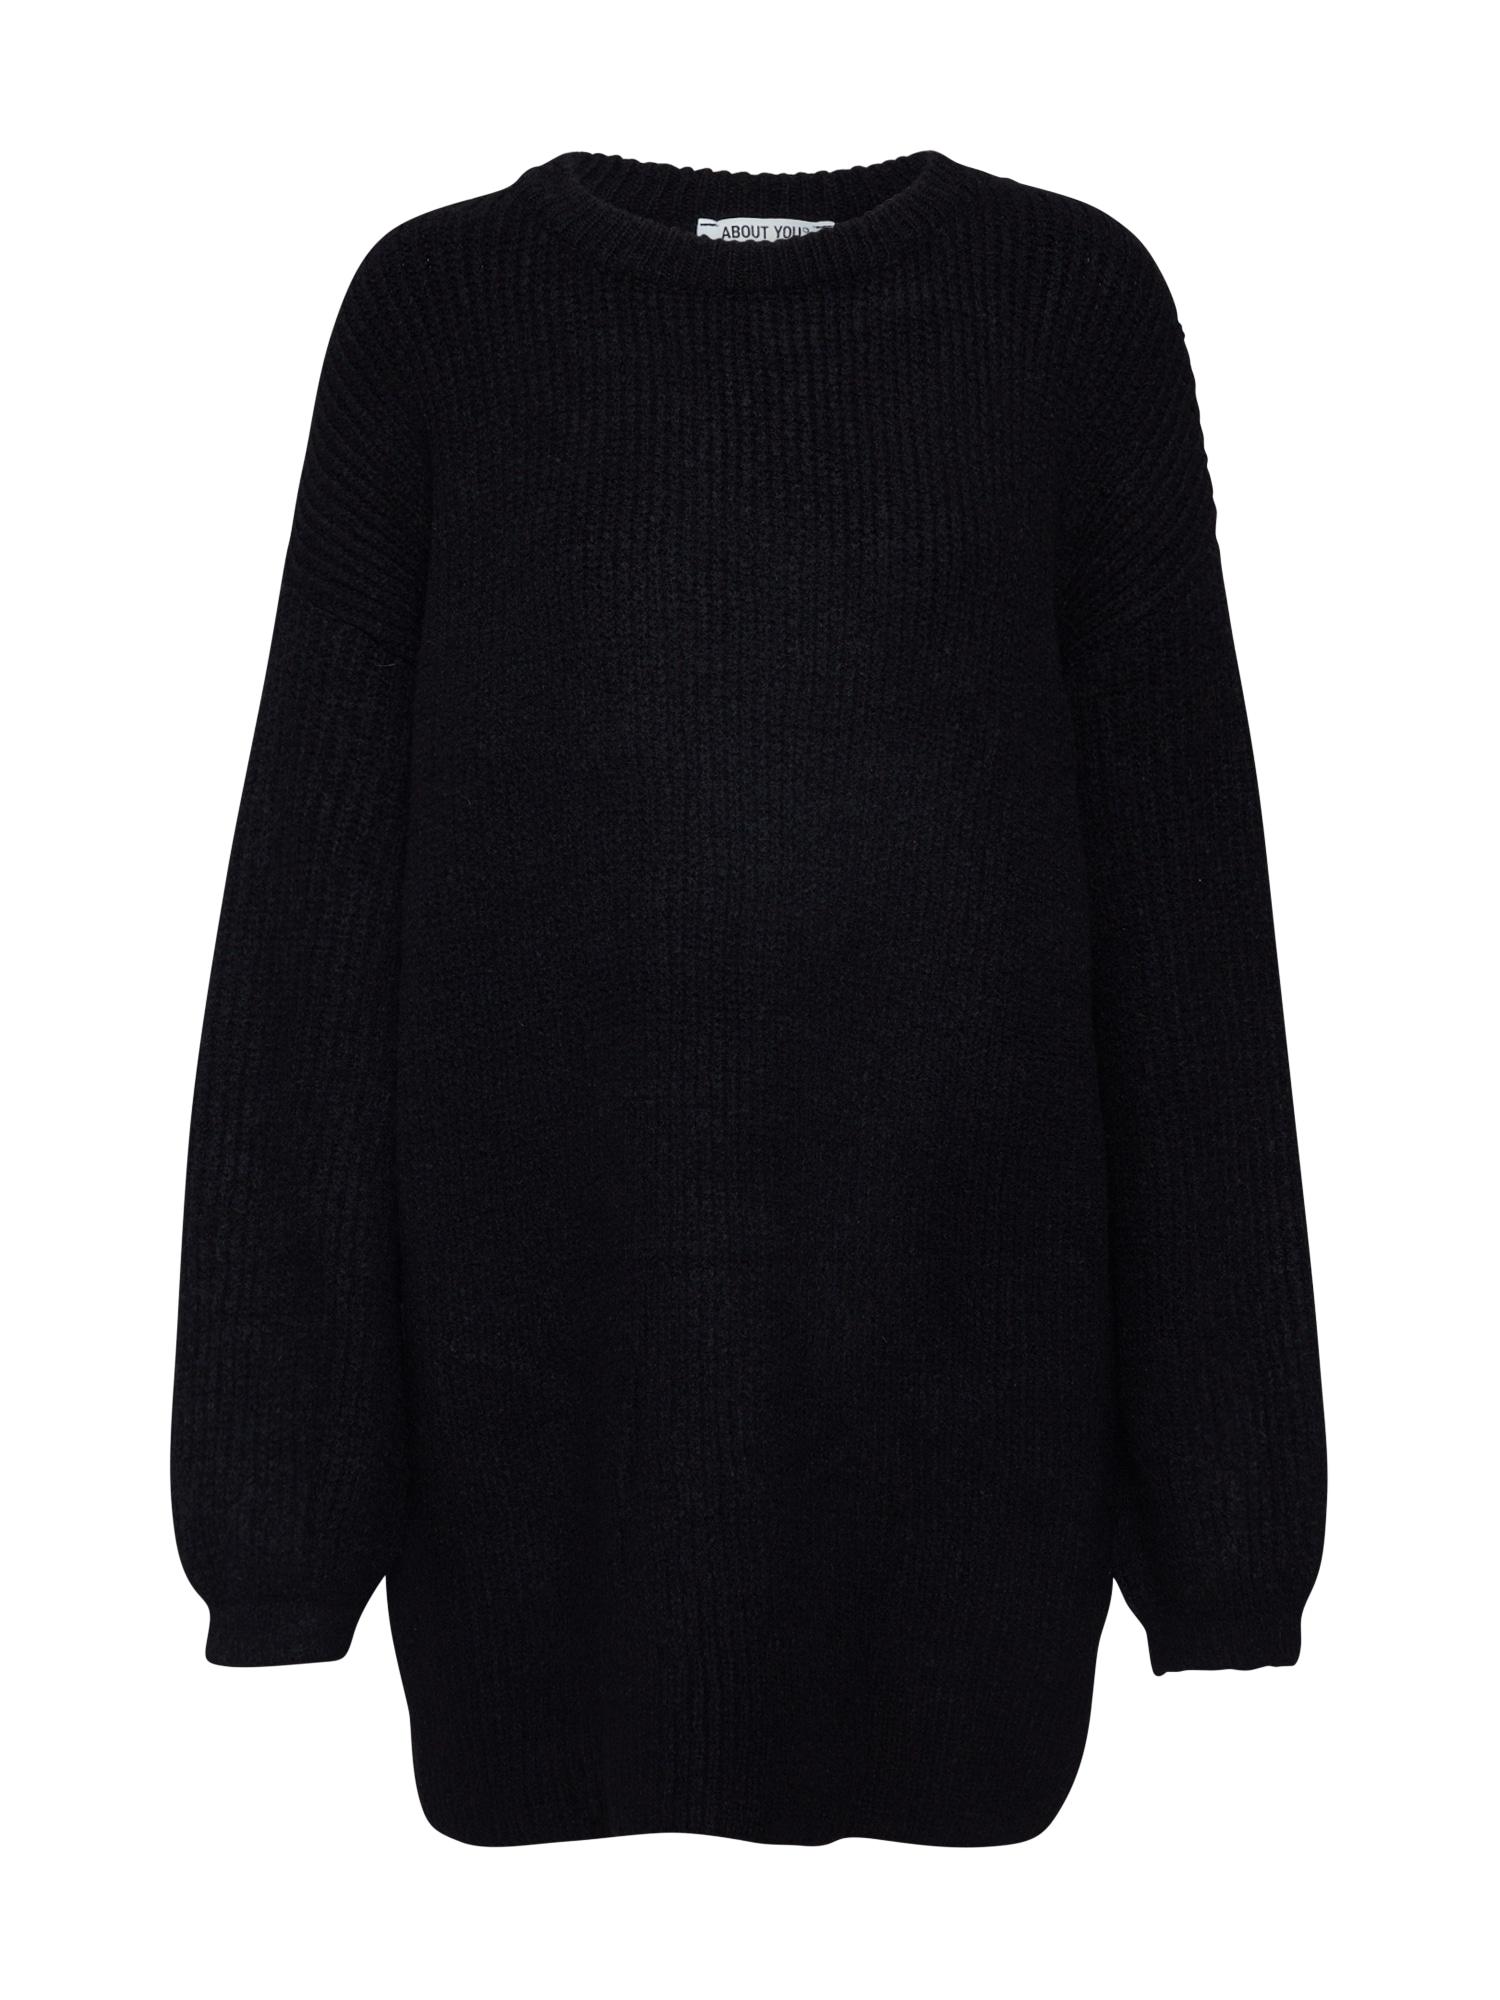 ABOUT YOU Laisvas megztinis 'Mina' juoda